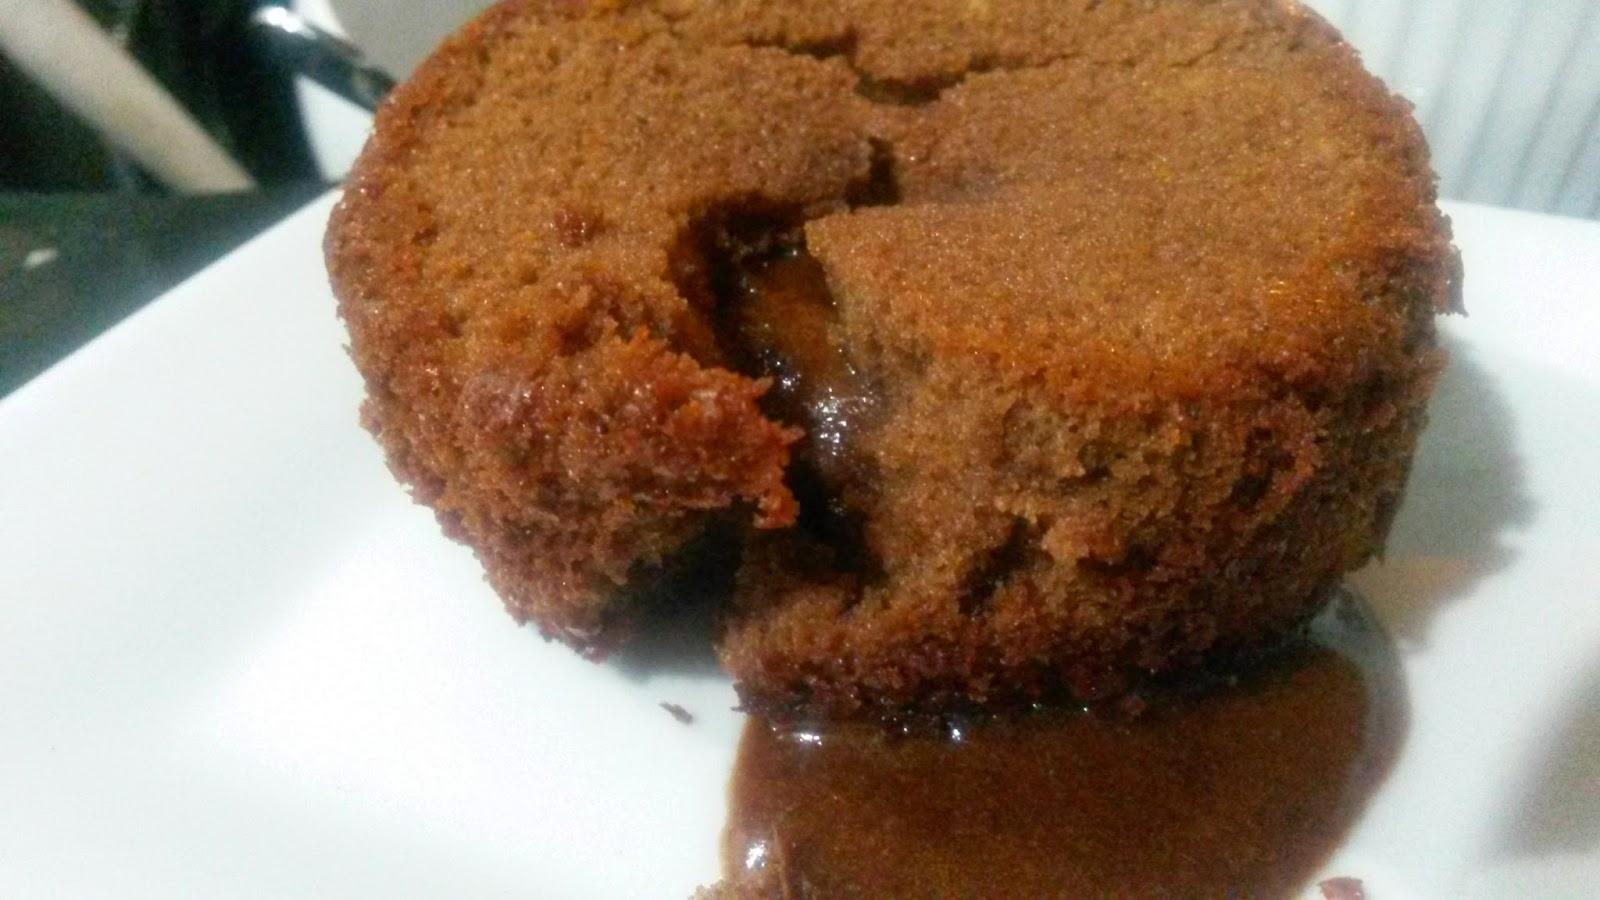 the delightful molten chocolate cake